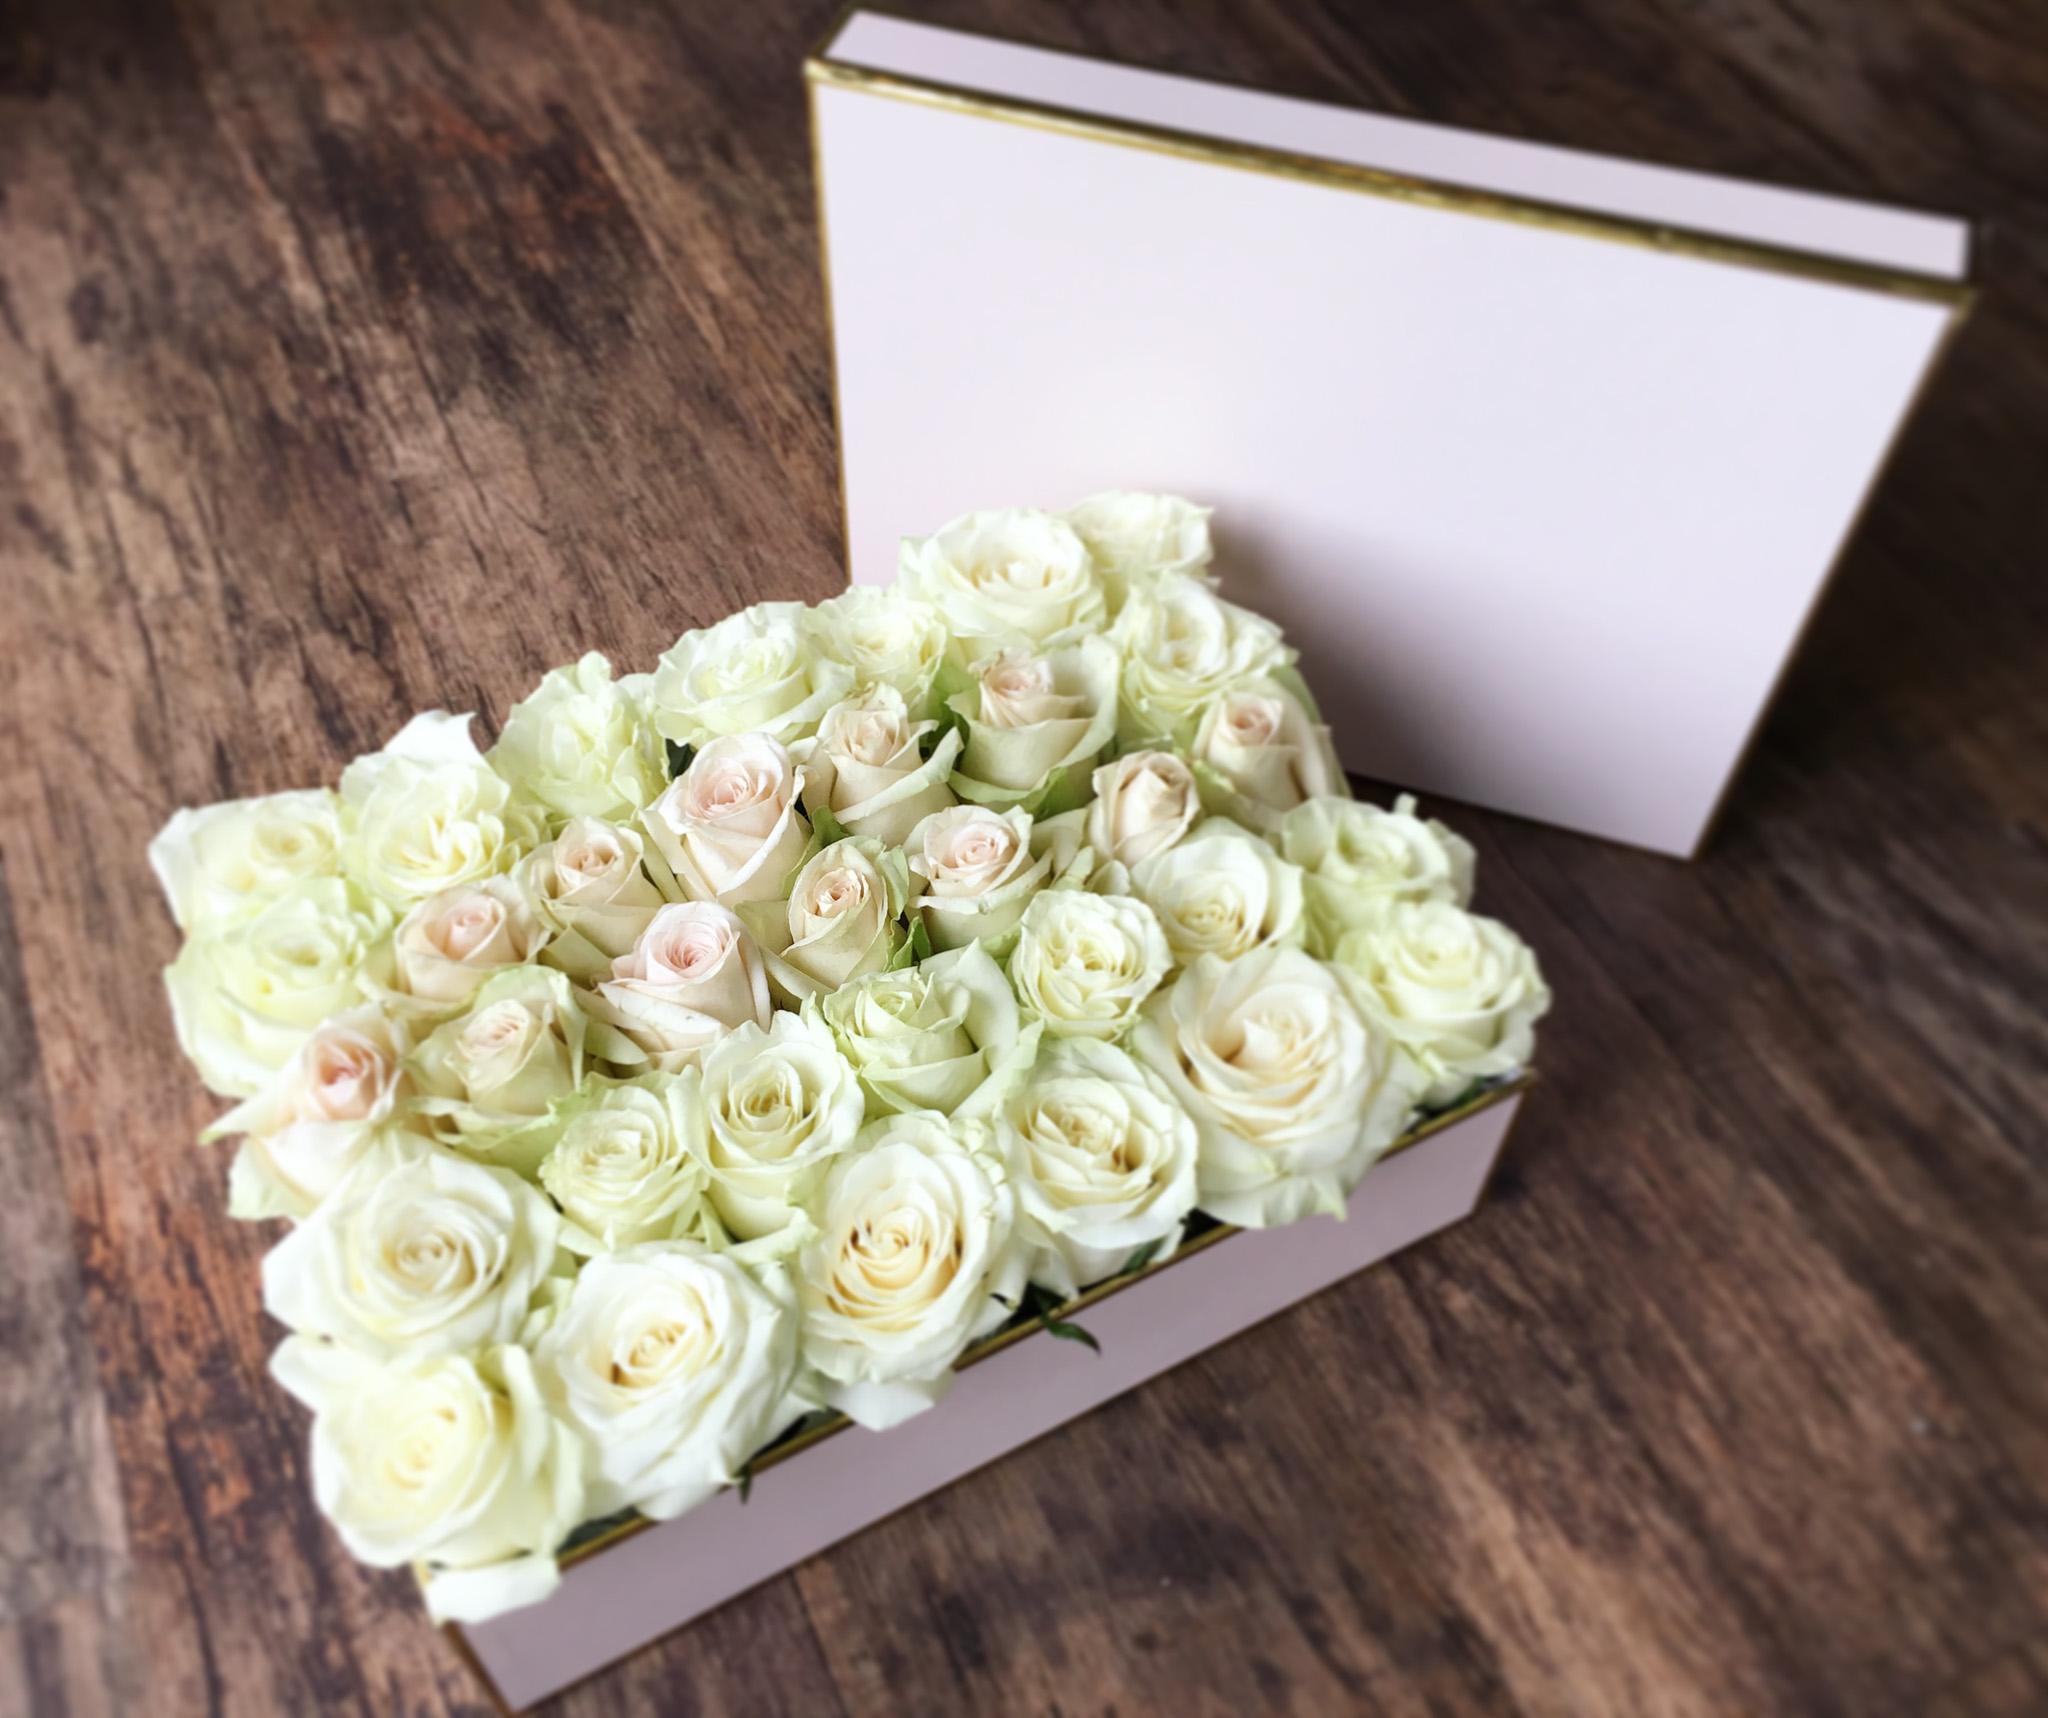 mckenziechic_flowerbox_flat_cincinnatiflowers.jpg